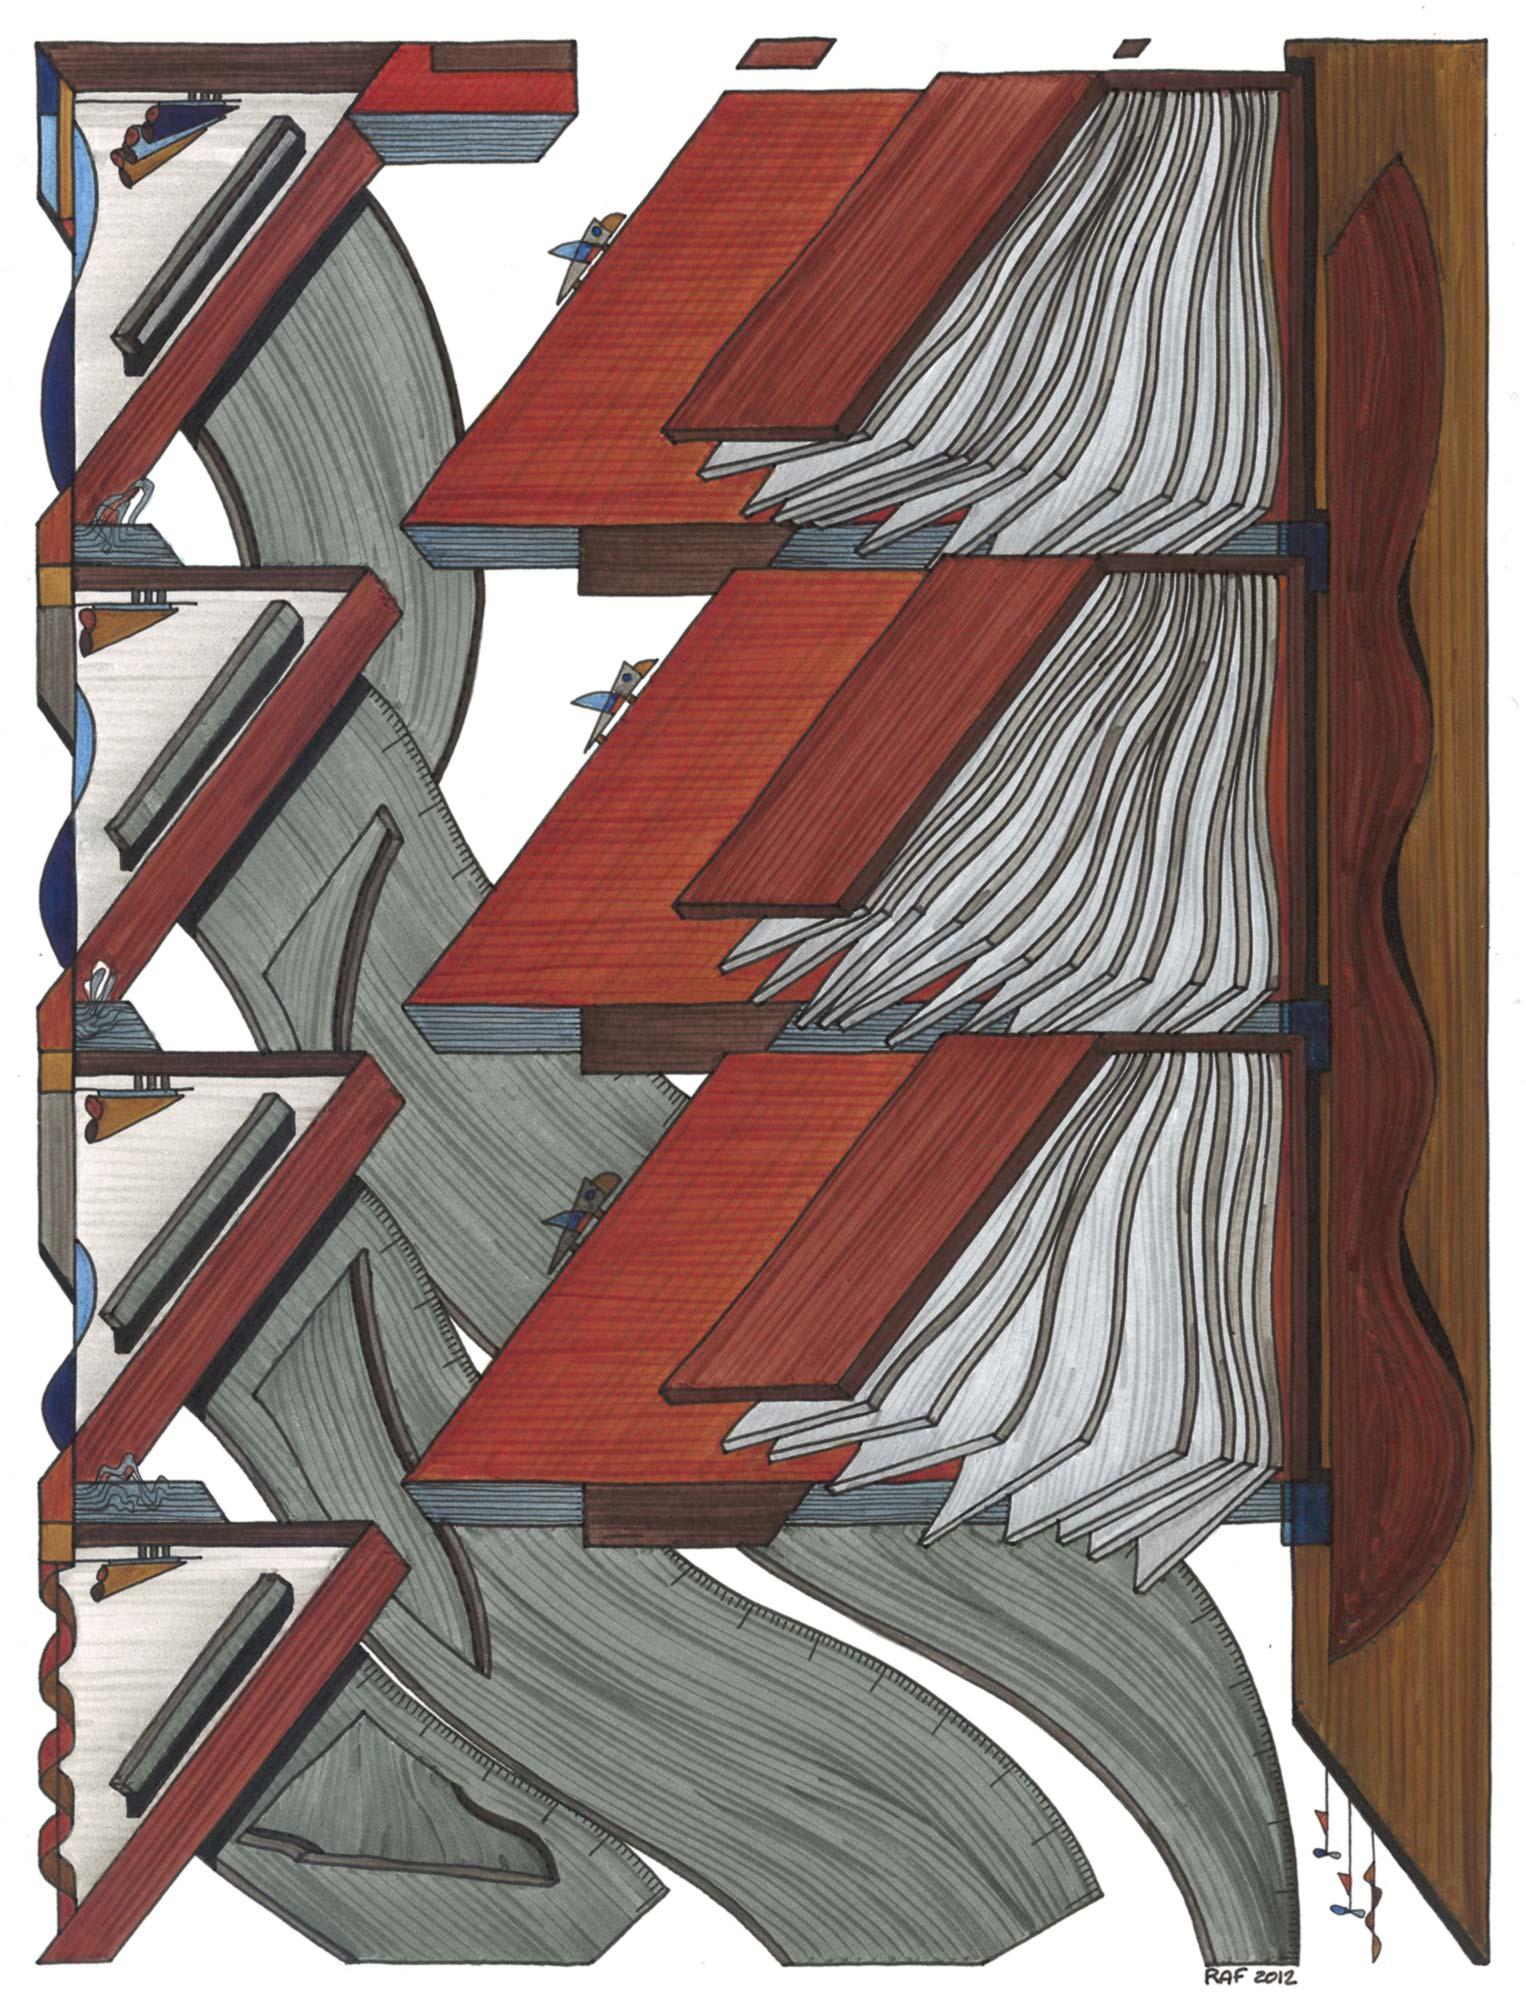 Grands livres, dessin, Raf Listowski, 2012